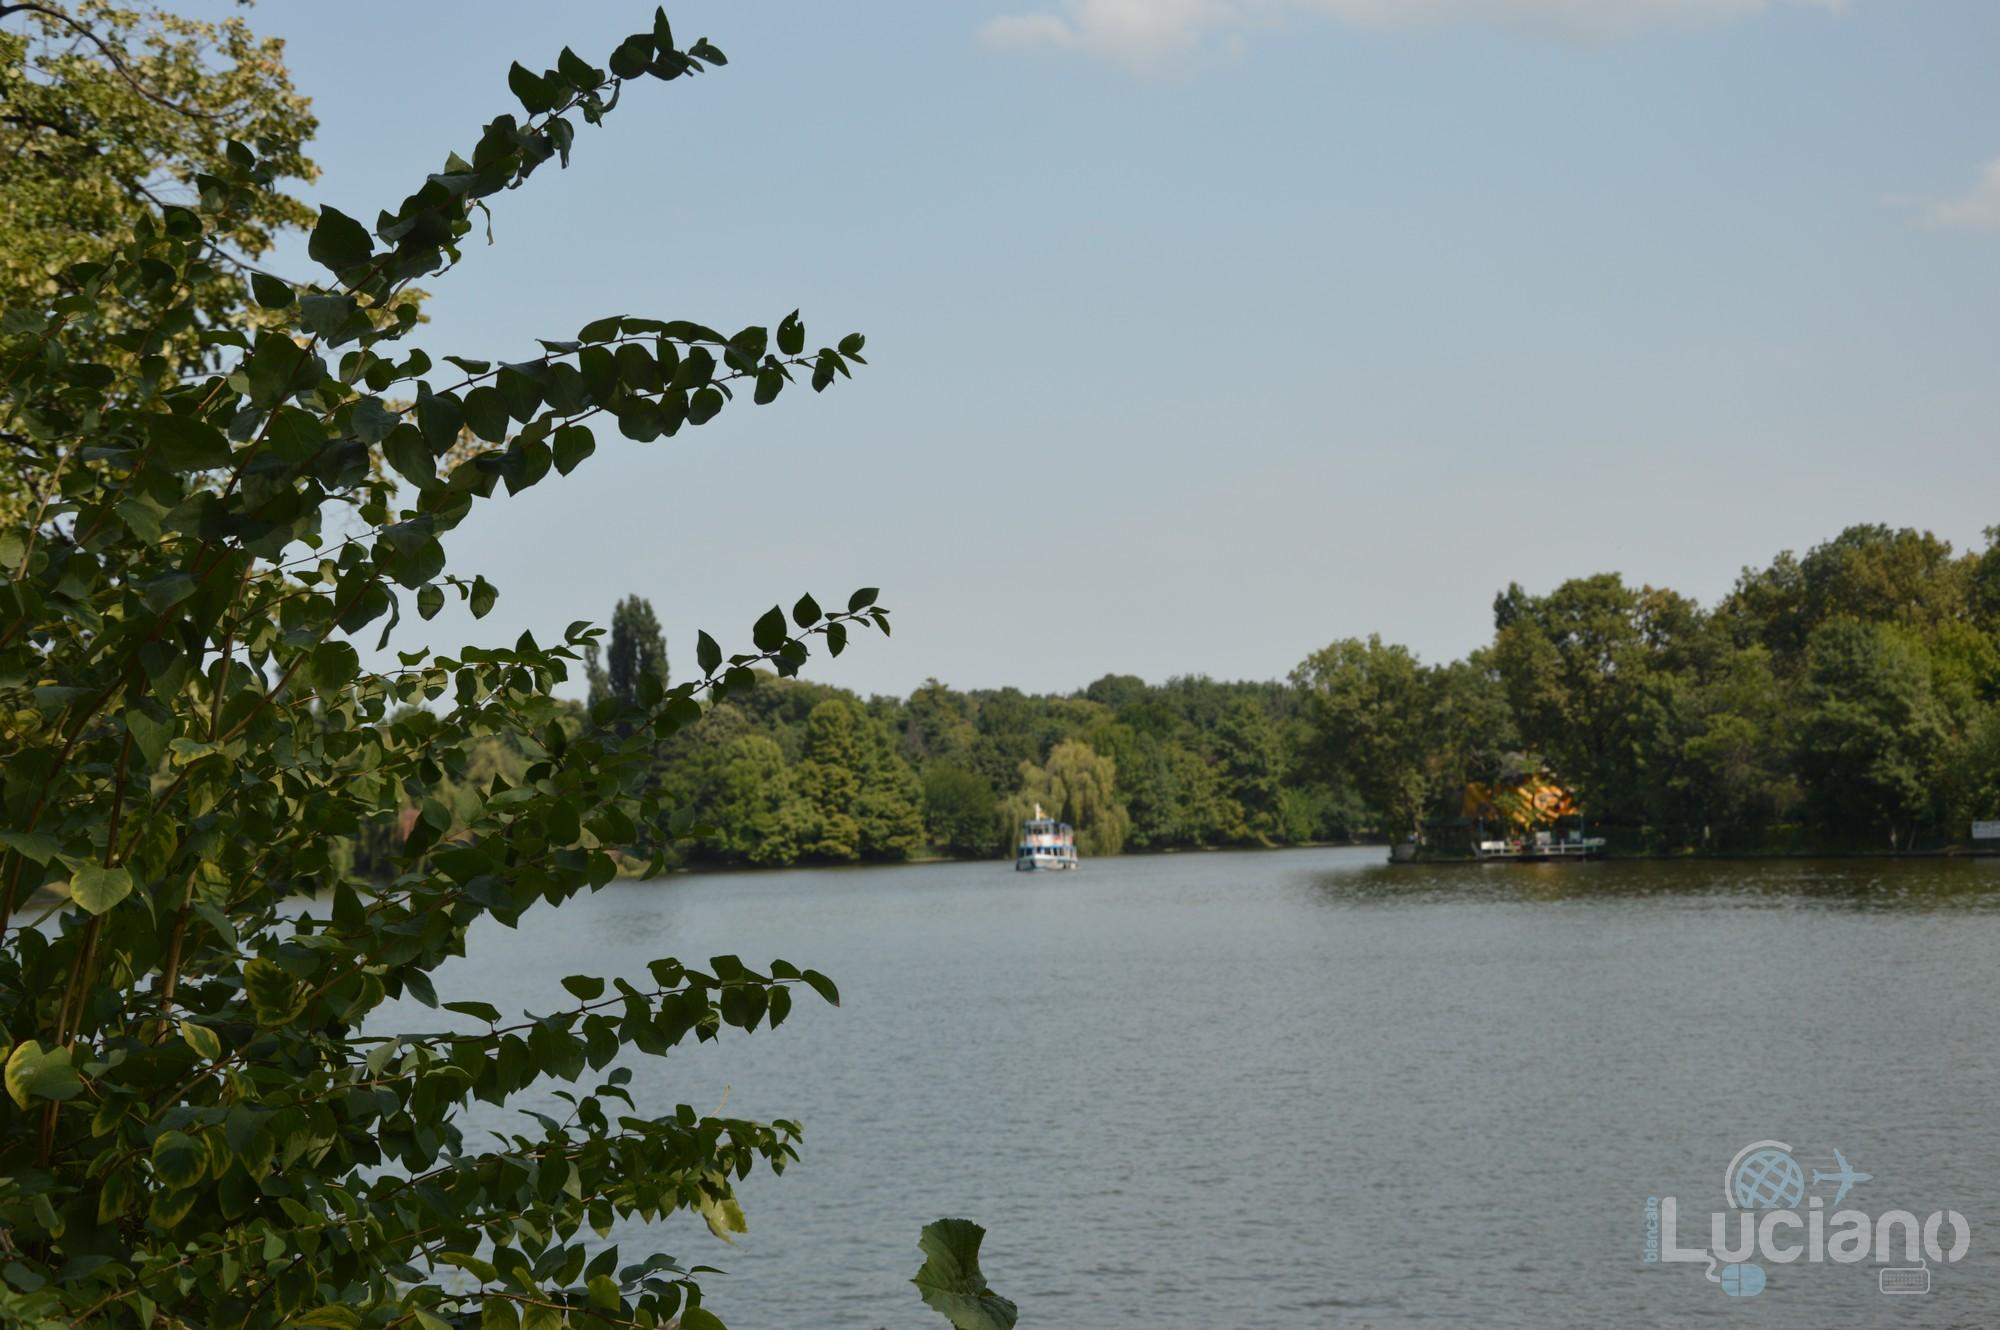 passeggiando per il King Michael I Park - Parcul Regele Mihai I al României